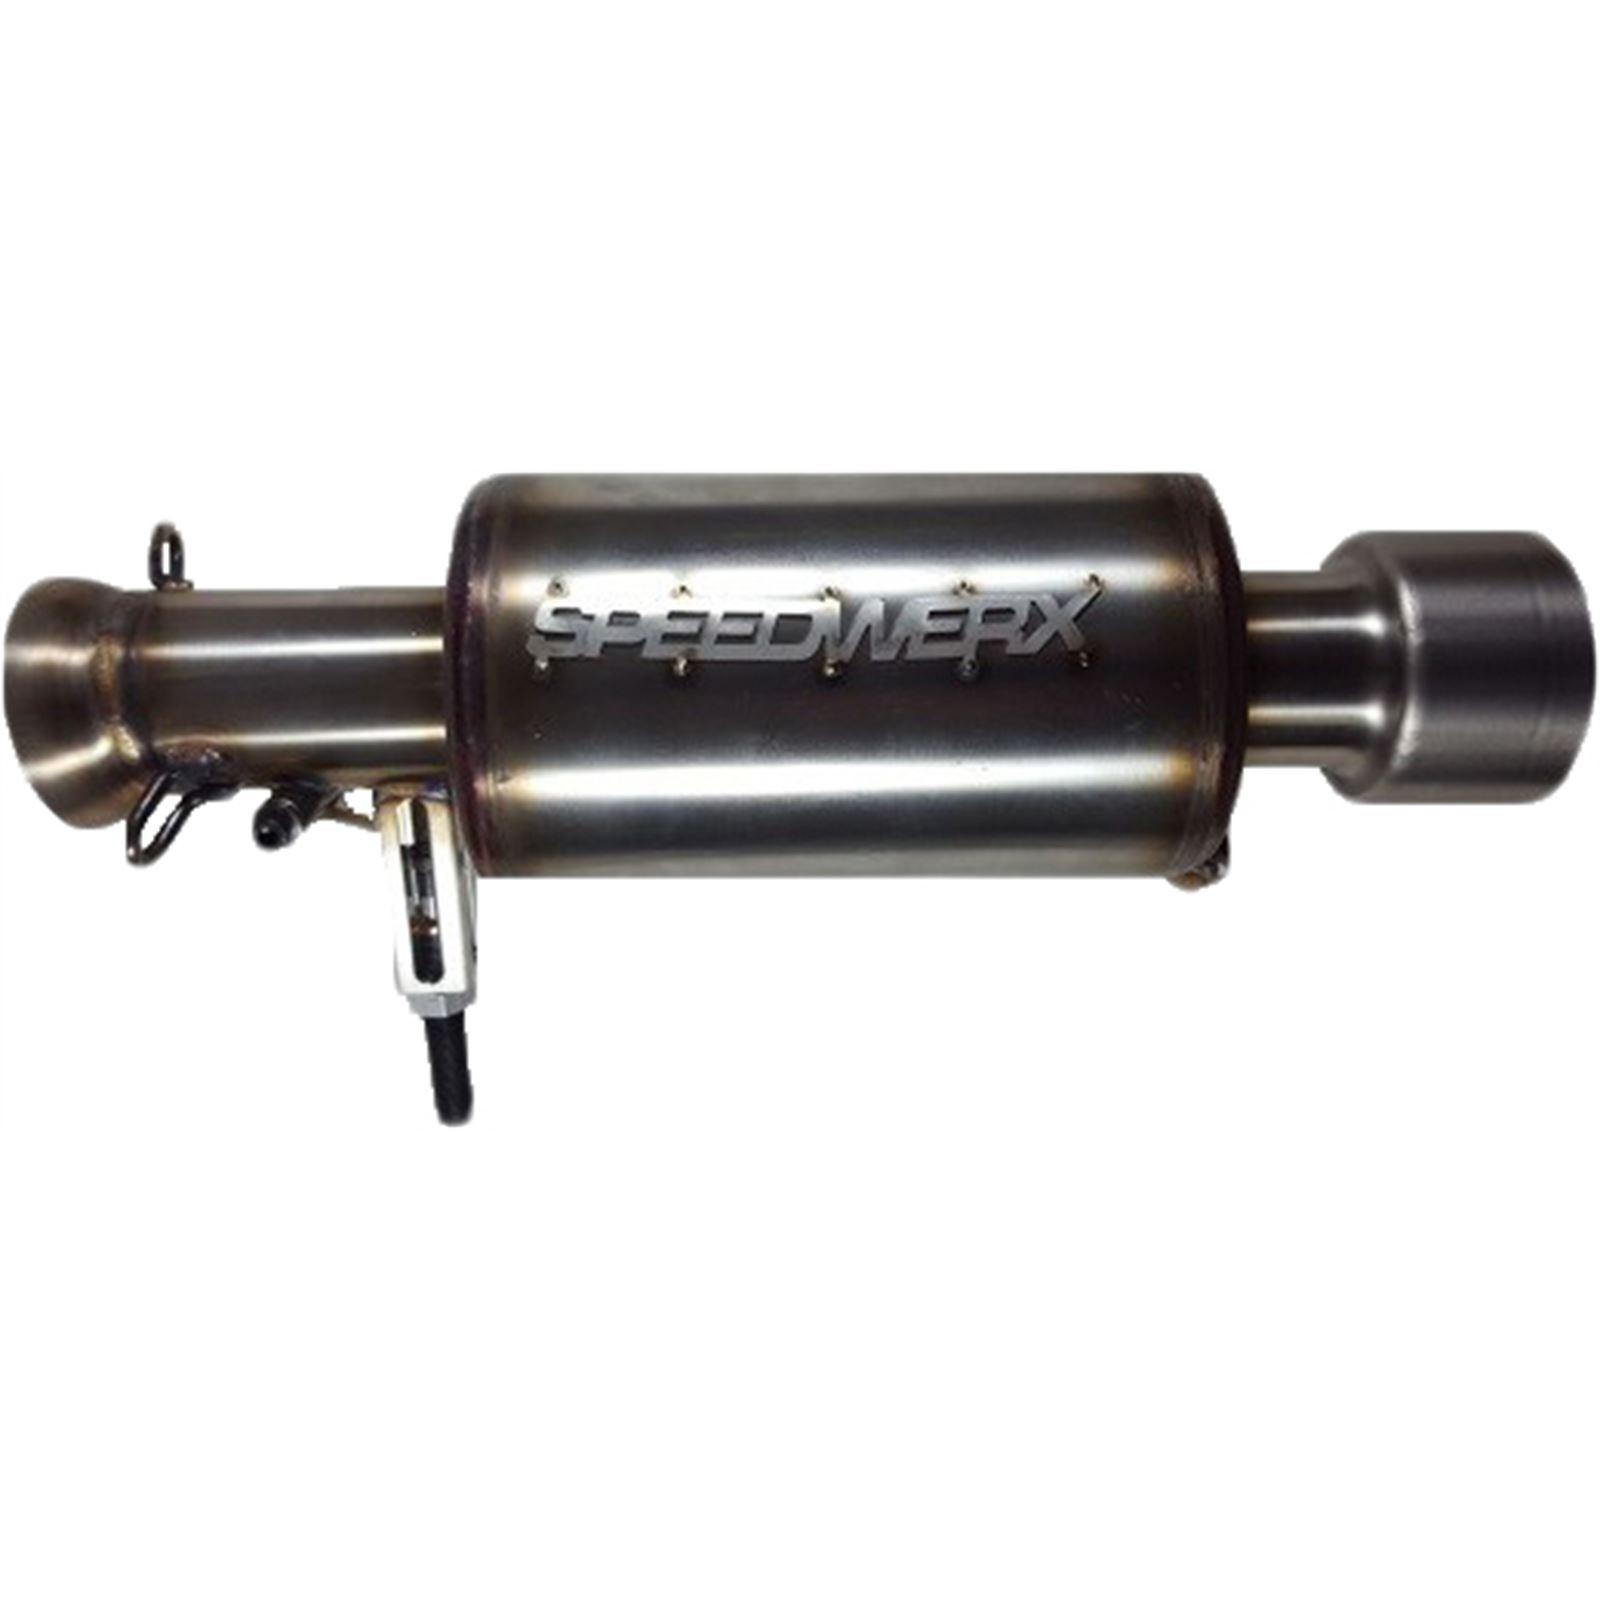 Speedwerx Competition L2 Series Muffler